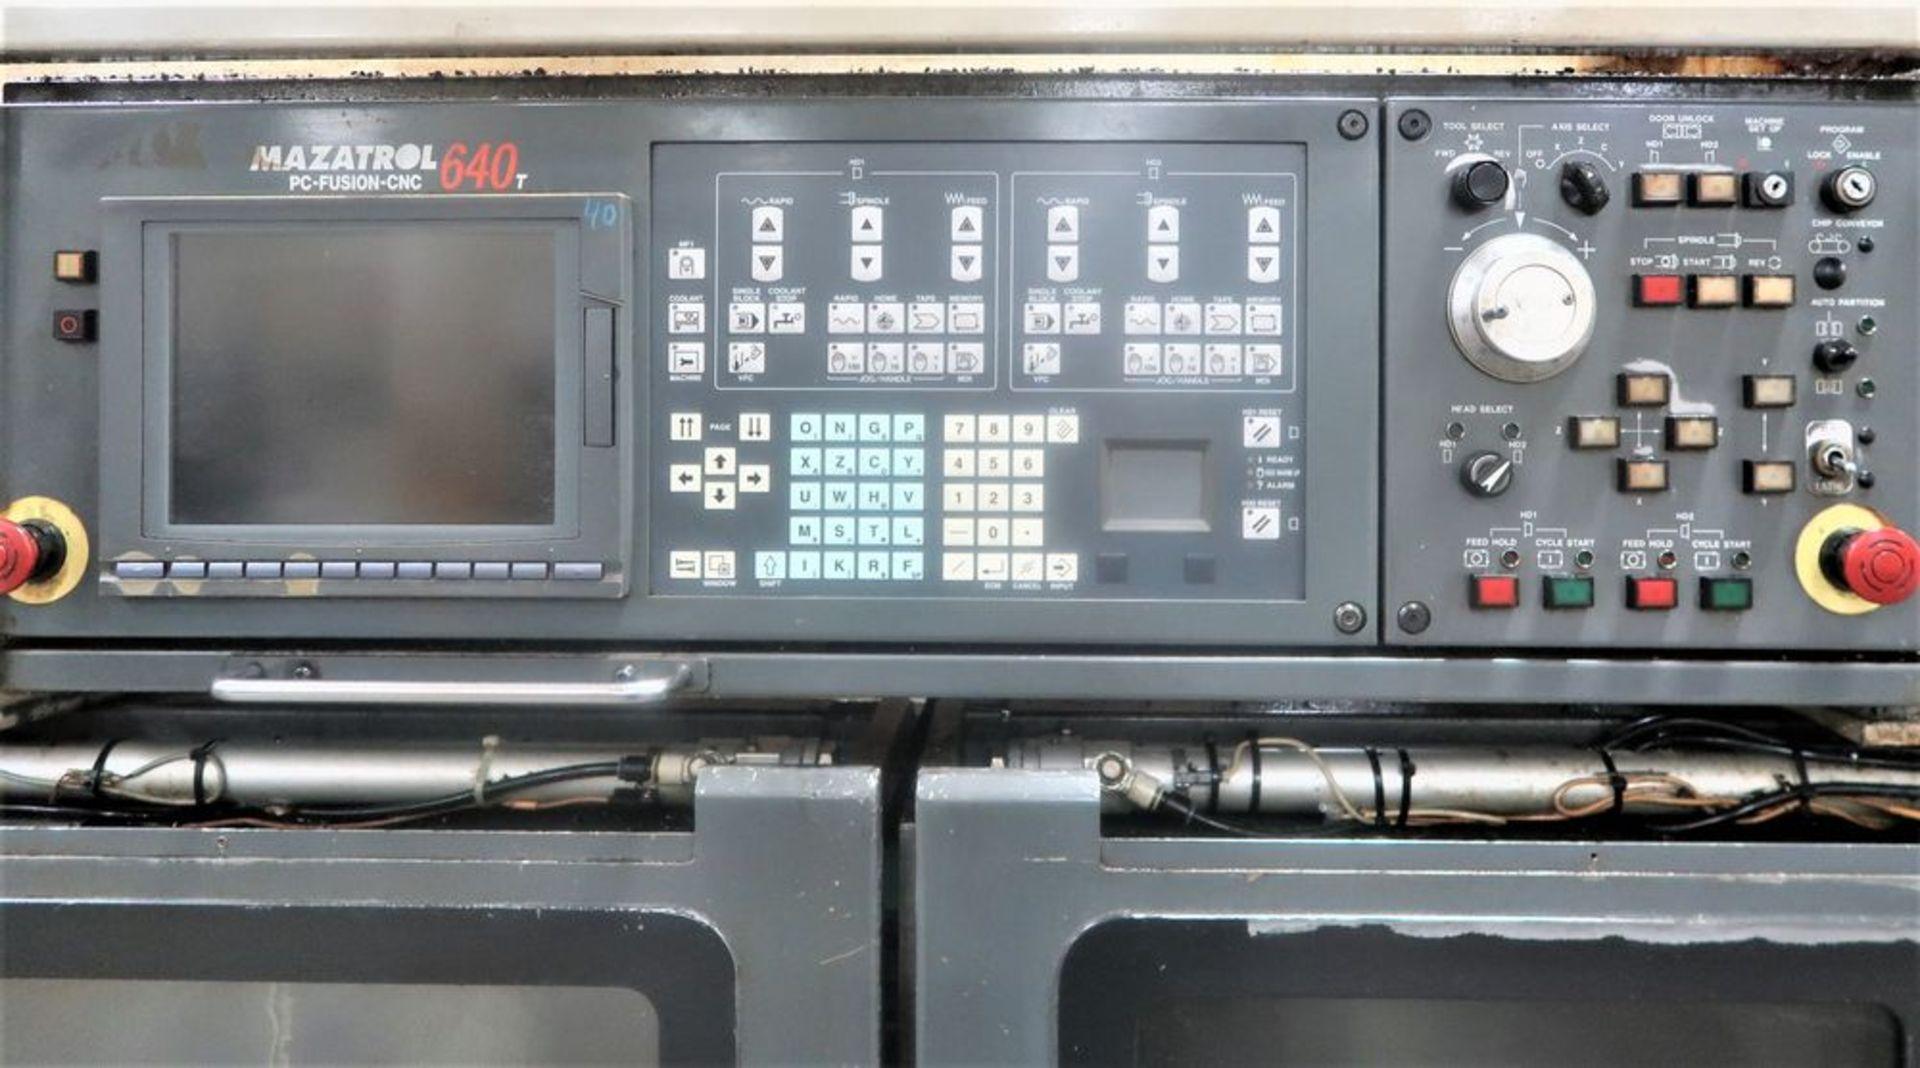 Lot 37 - Mazak Multiplex 6200 Twin Spindle CNC Turning Center Lathe, S/N 161327